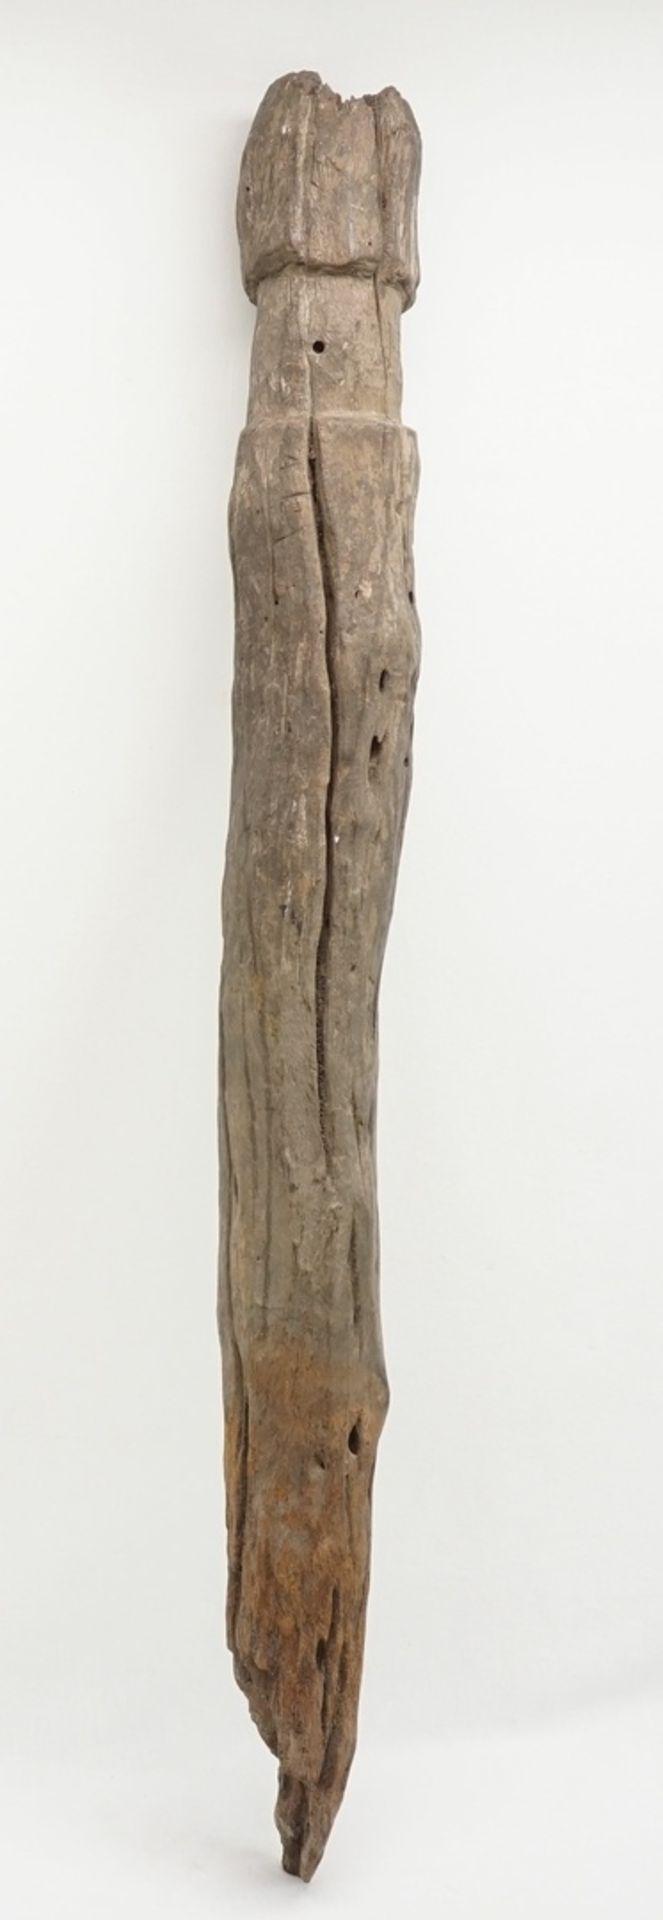 "Pfahlfigur ""bochio"", Benin, Fon - Bild 2 aus 2"